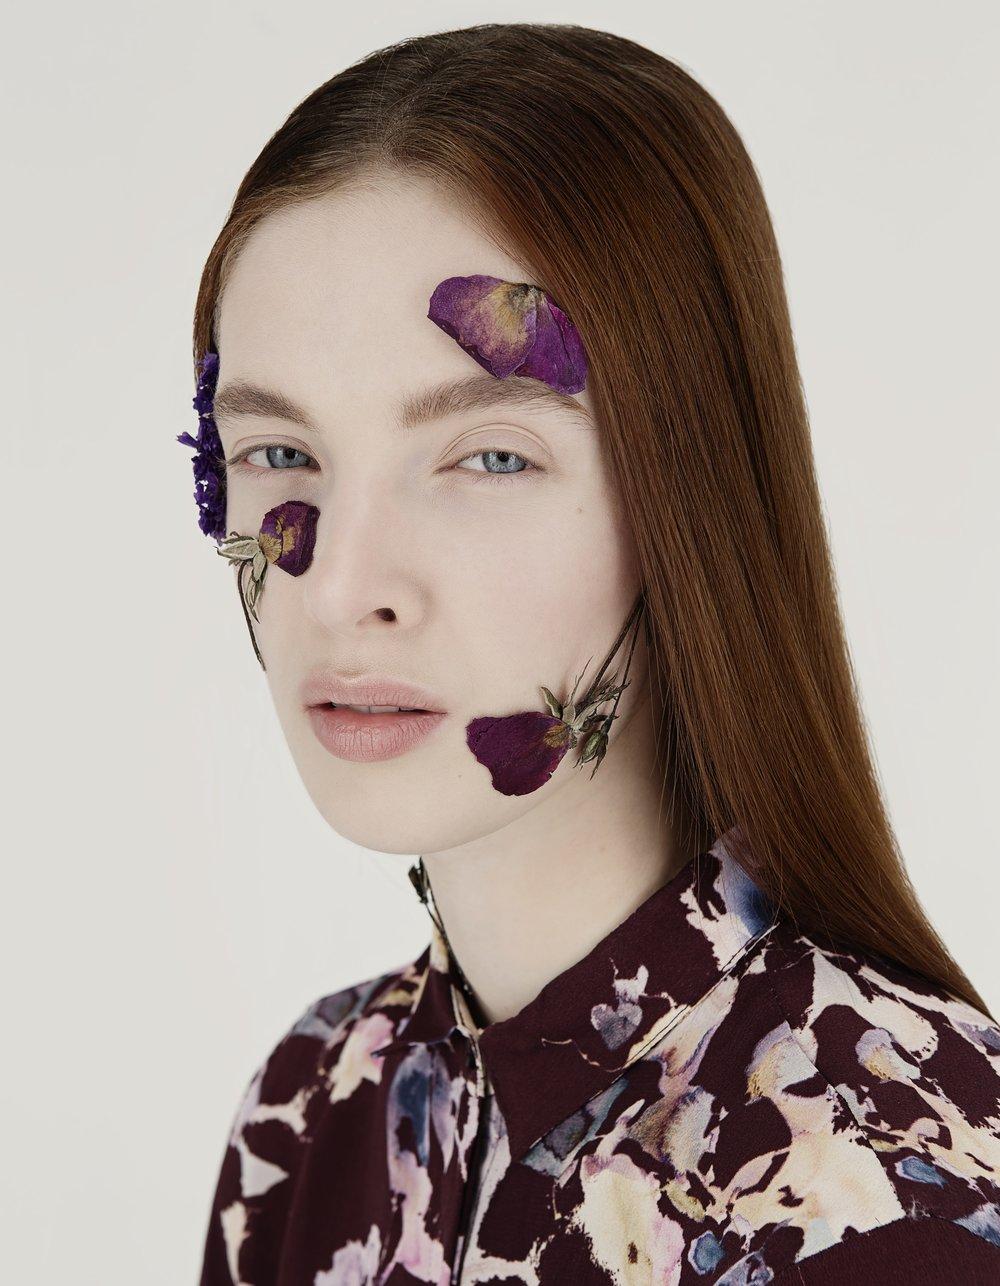 PHOTOGRAPHY Denise Boomkens @ Sticky Stuff | MUAH Alexandra Leijs | MODEL Gesine @ Micha Models